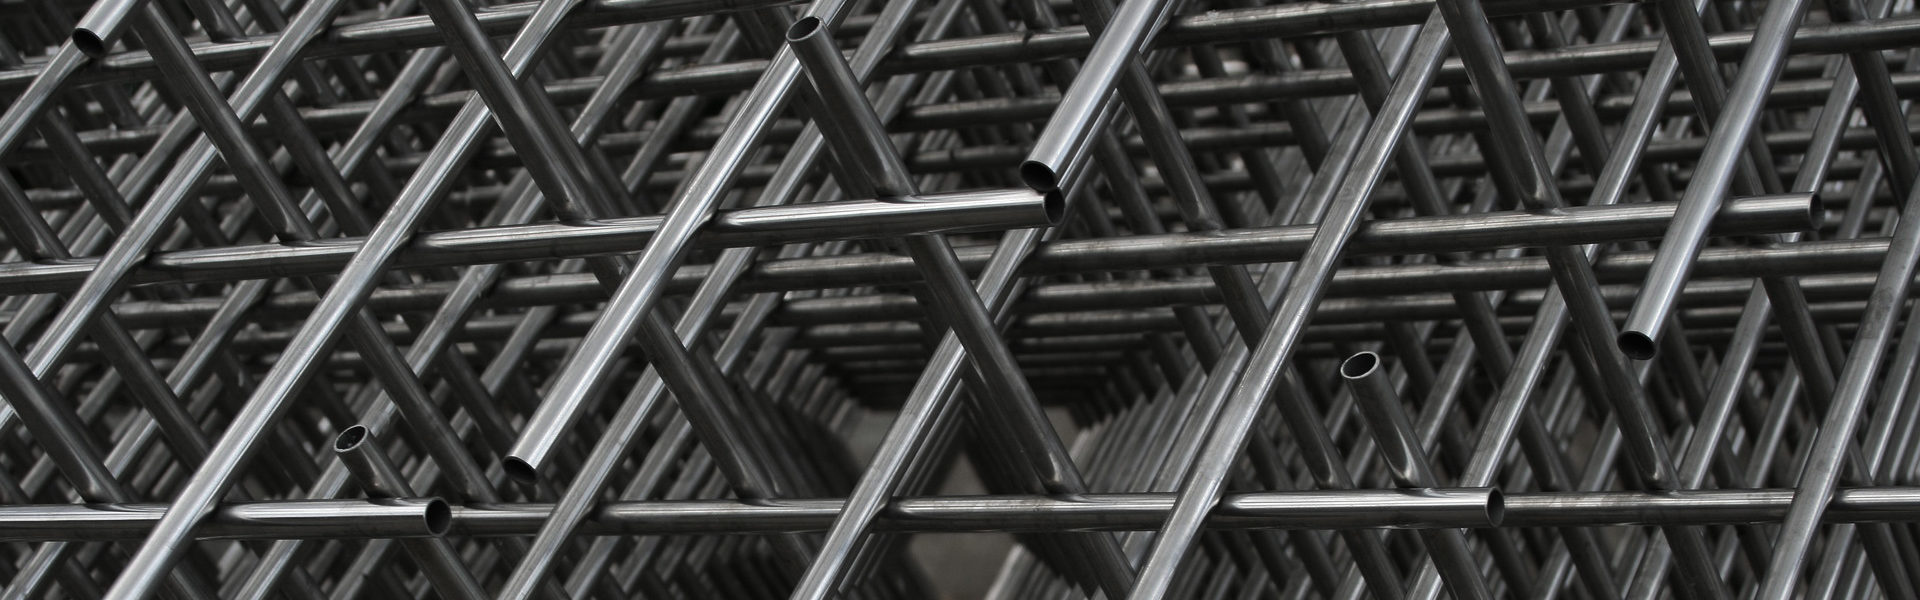 Merchant Steel Supply